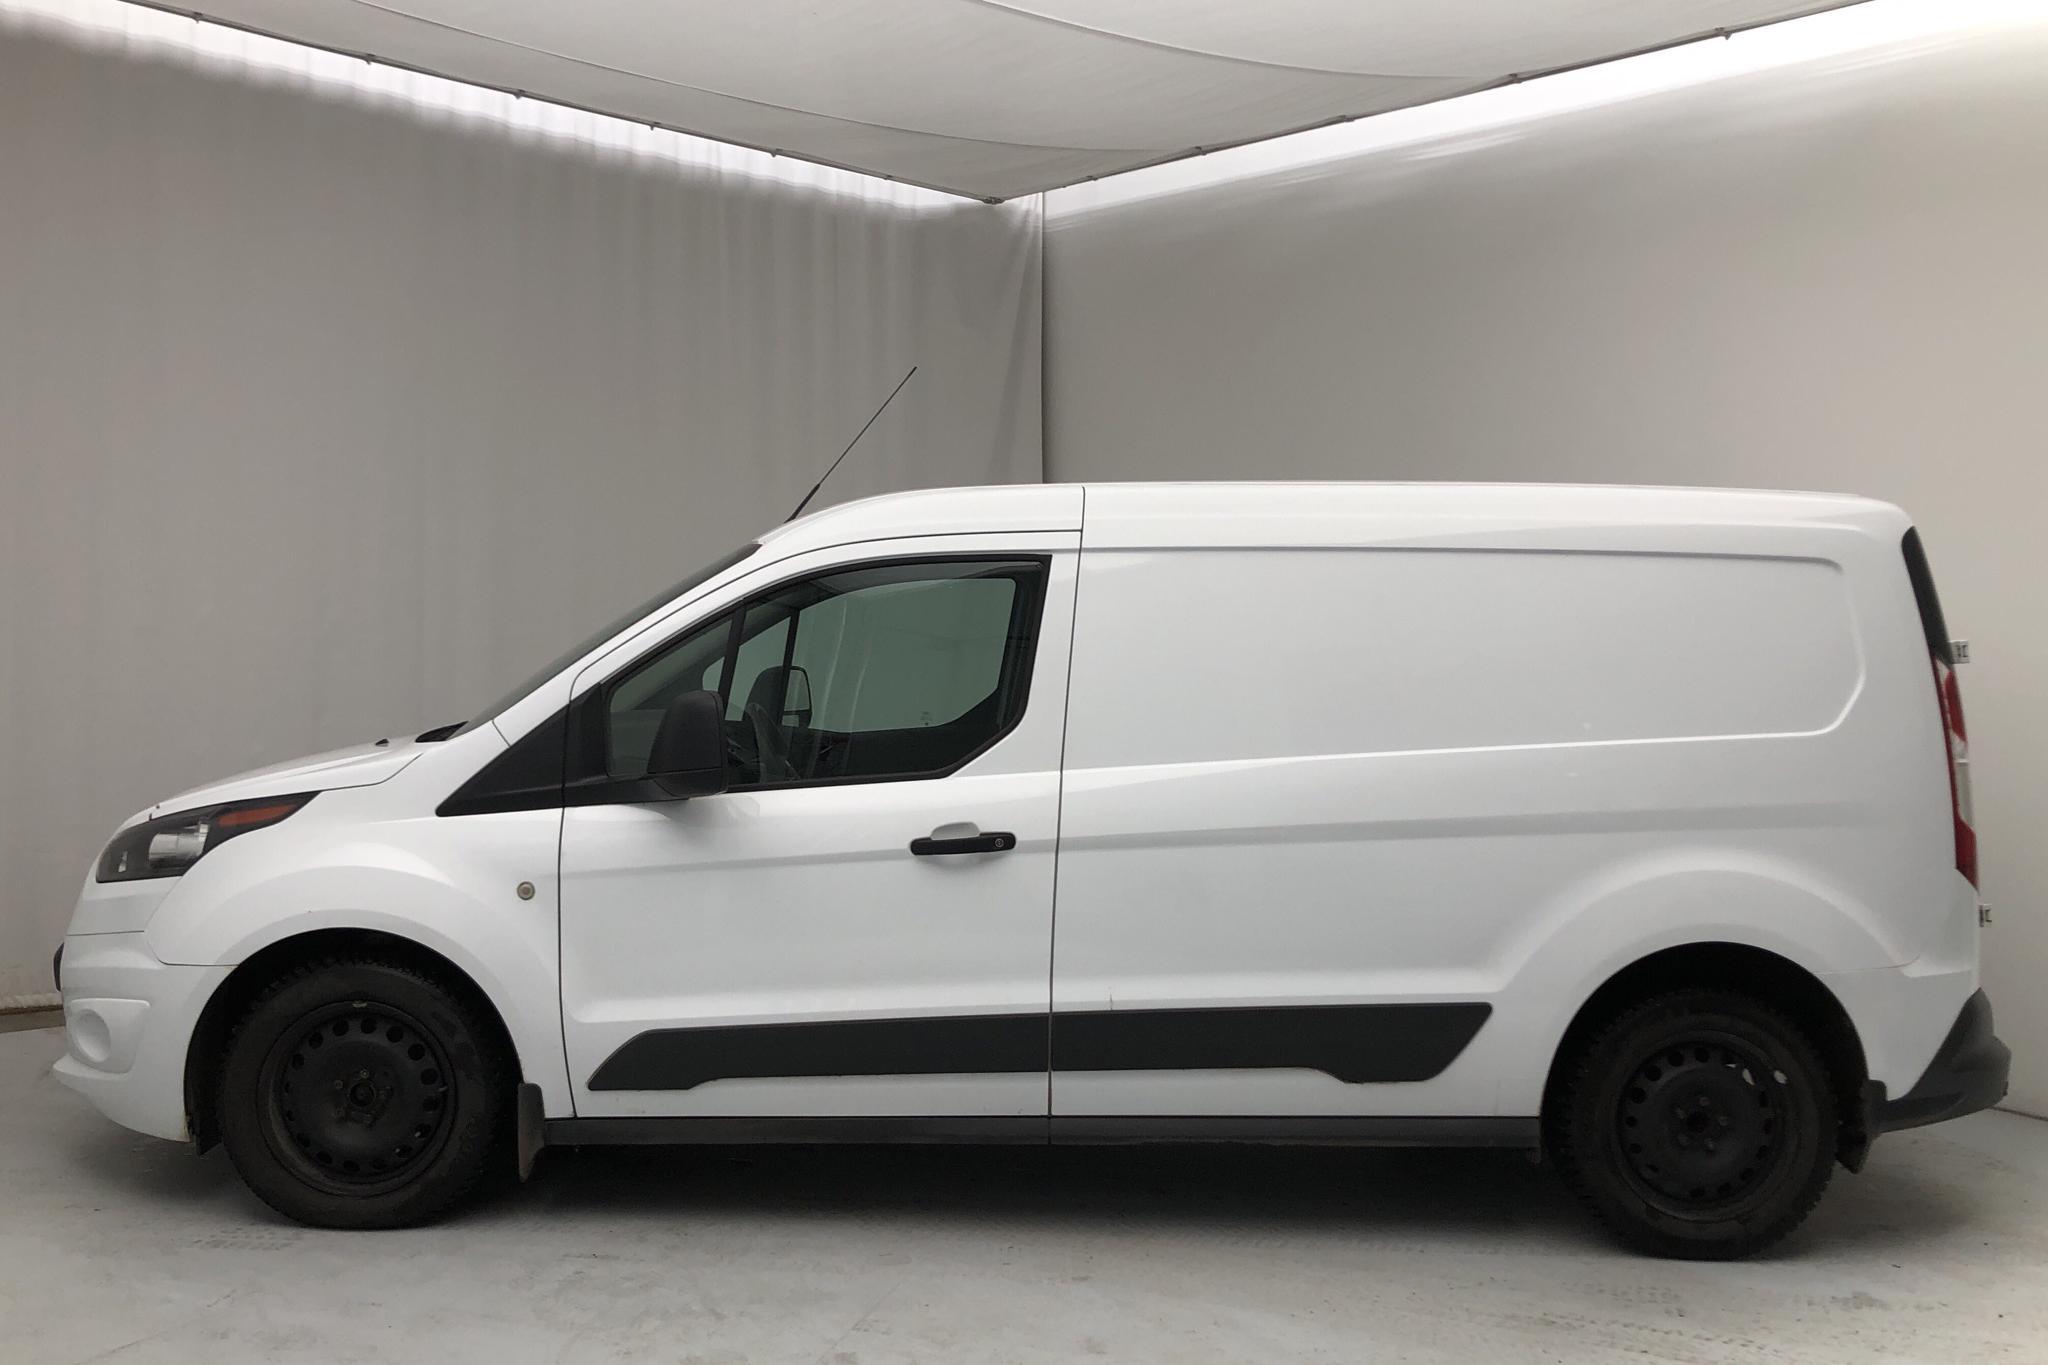 Ford Transit Connect 1.5 TDCi (100hk) - 1 996 mil - Manuell - vit - 2016